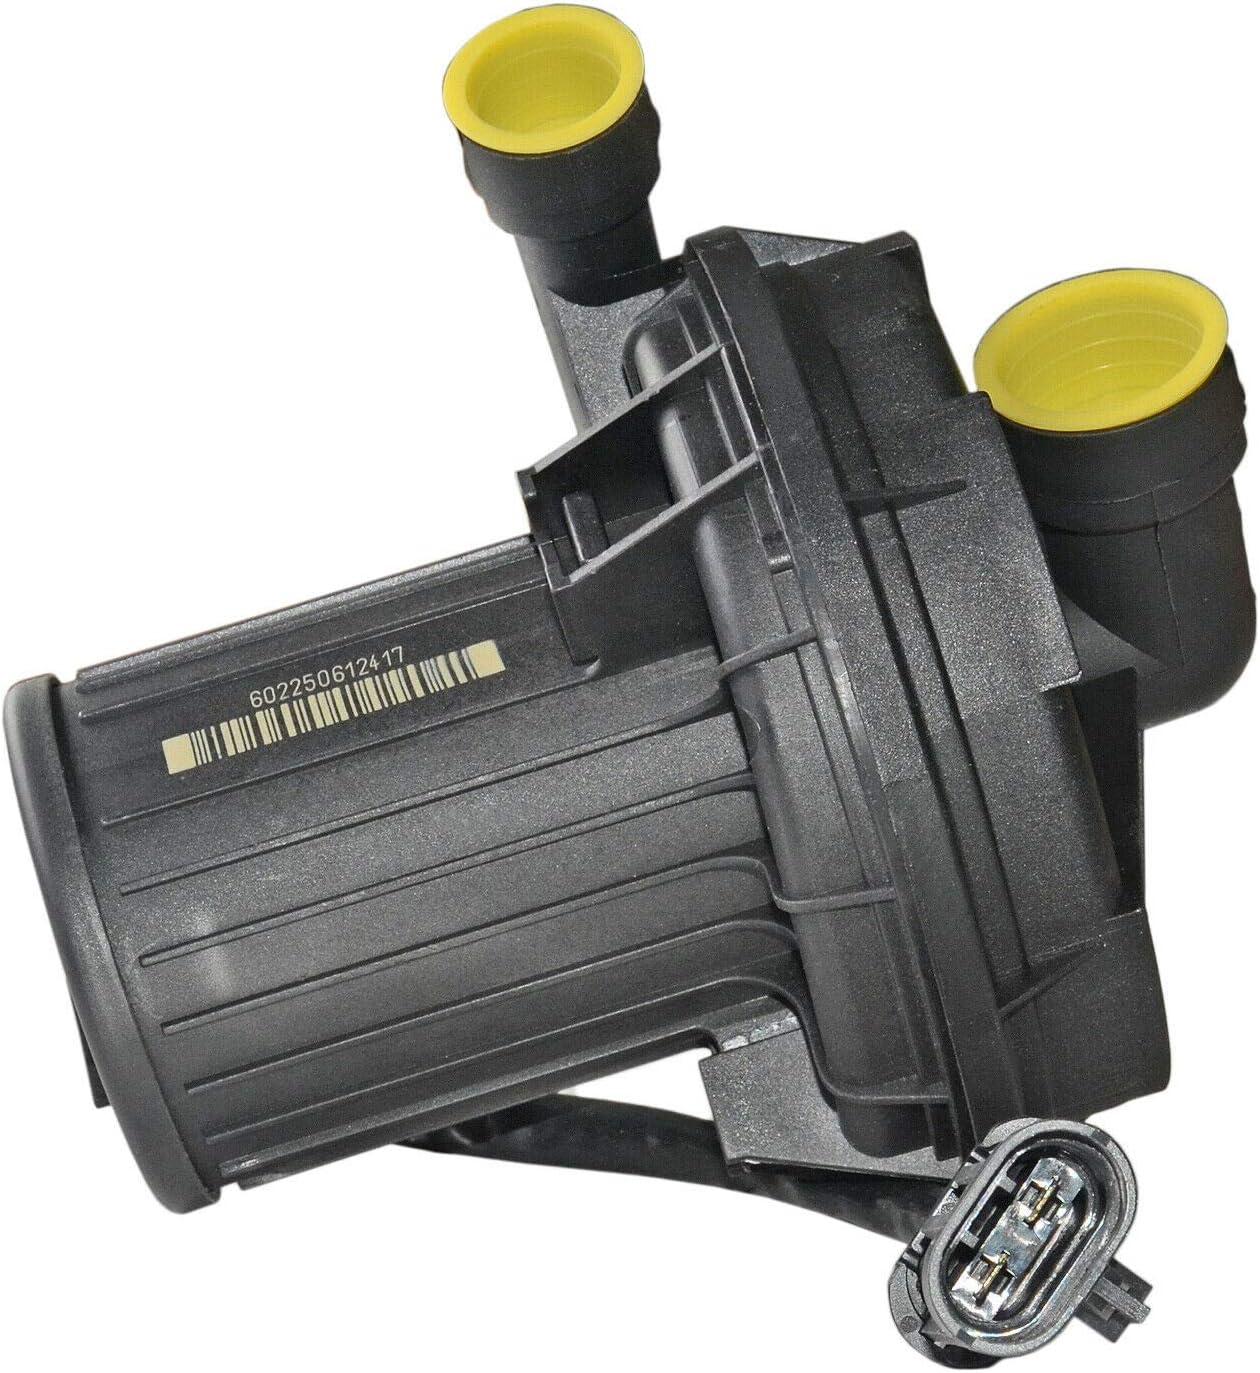 MSQ-CD Secondary Air Pump 12574379 215454 For Chevrolet Trailblazer Buick Rainier 4.2L 15097130 322402M